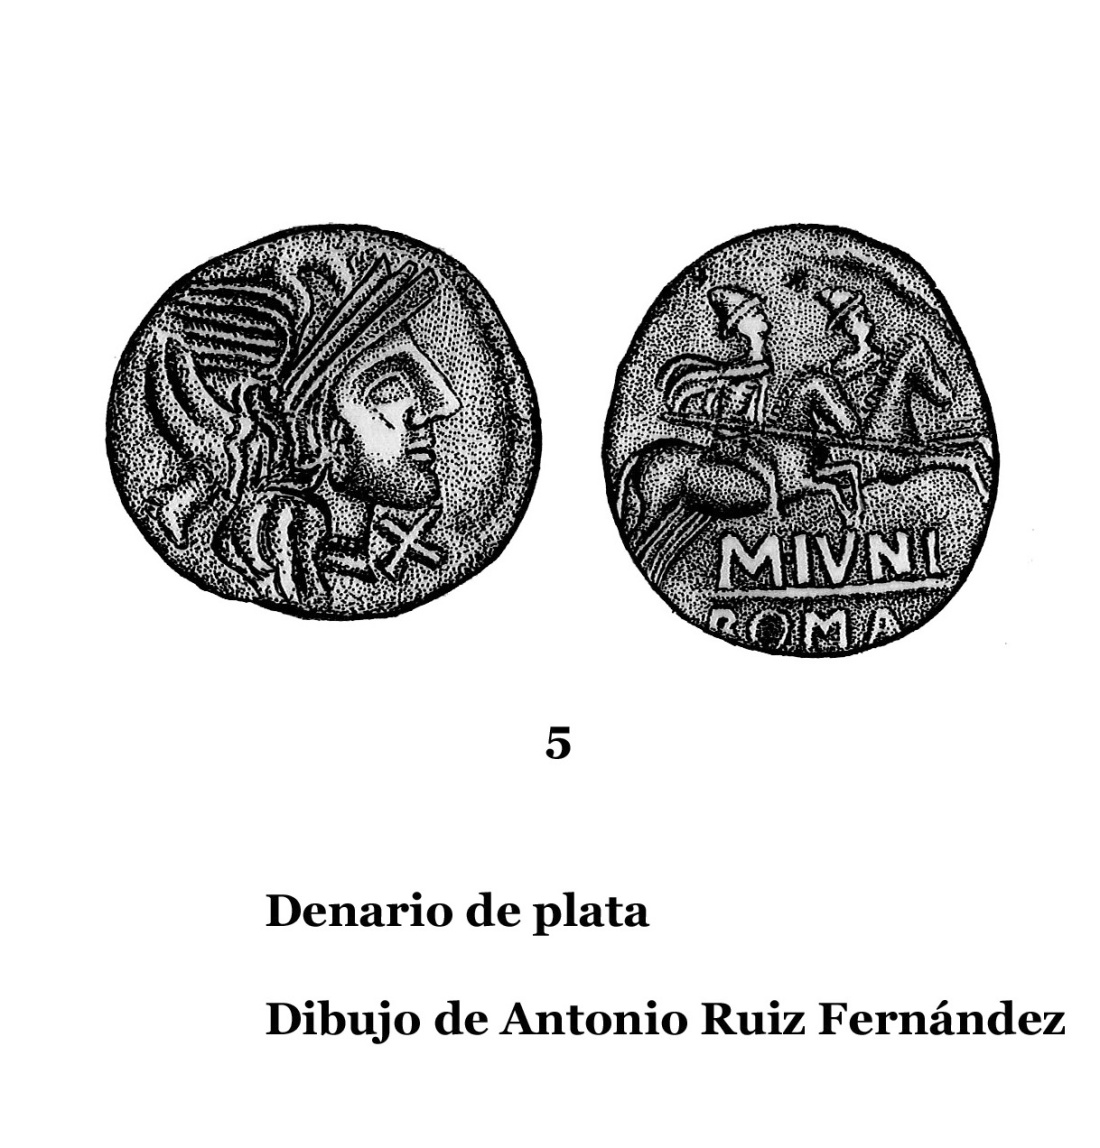 5DENARIOS DE PLATA, DIBUJOS 5